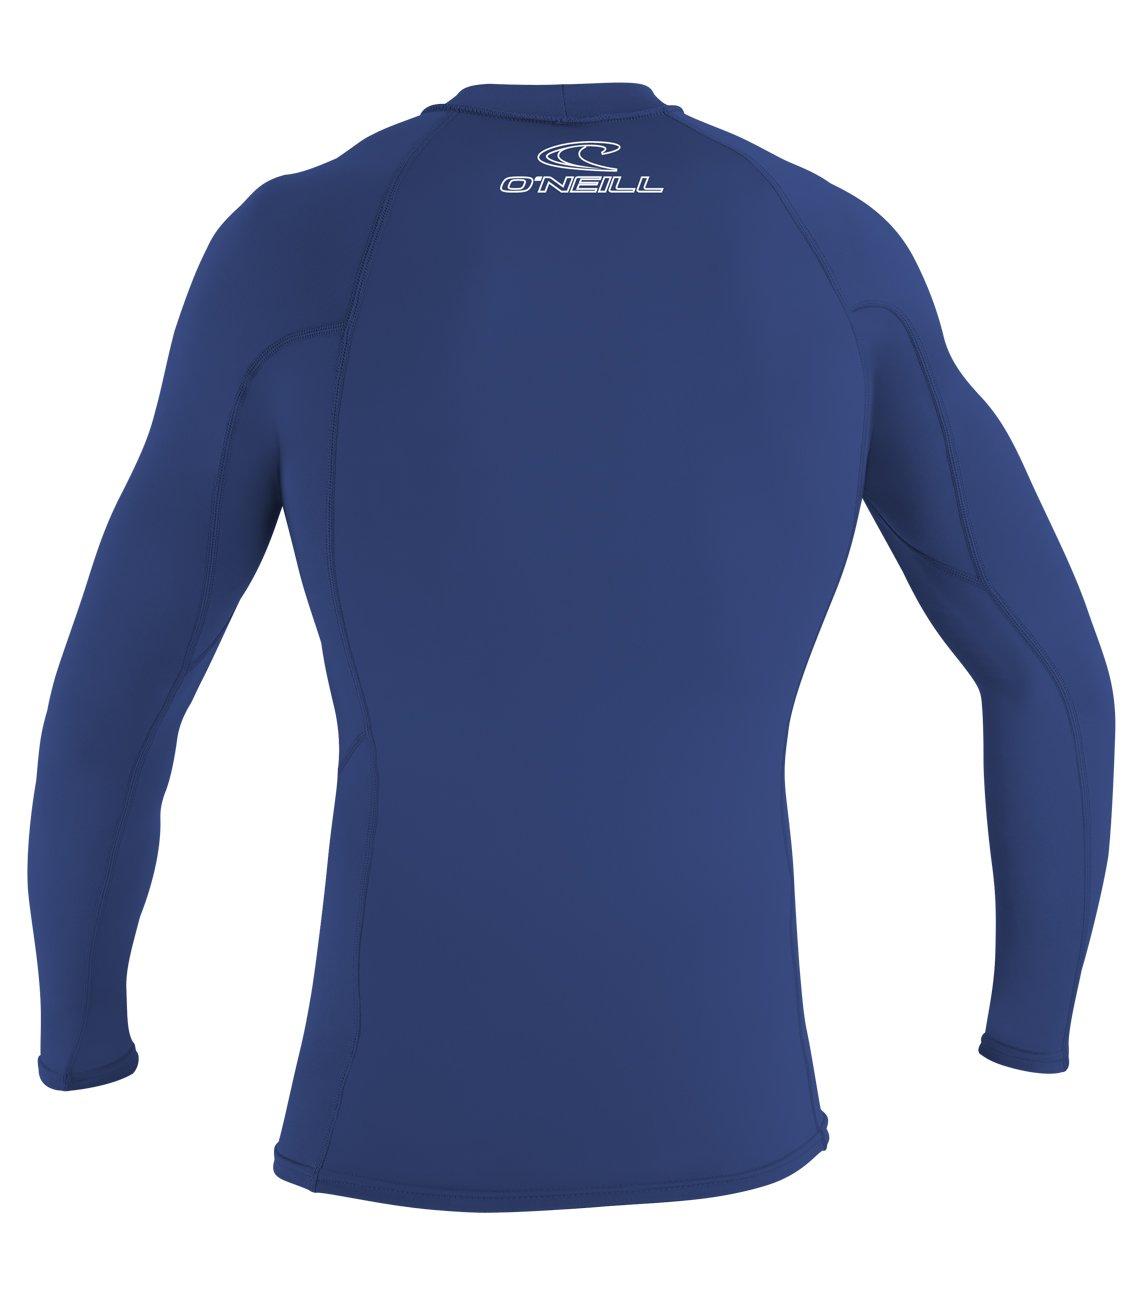 ONeill UV Sun Protection, Camiseta de Manga Larga para Hombre: Amazon.es: Deportes y aire libre